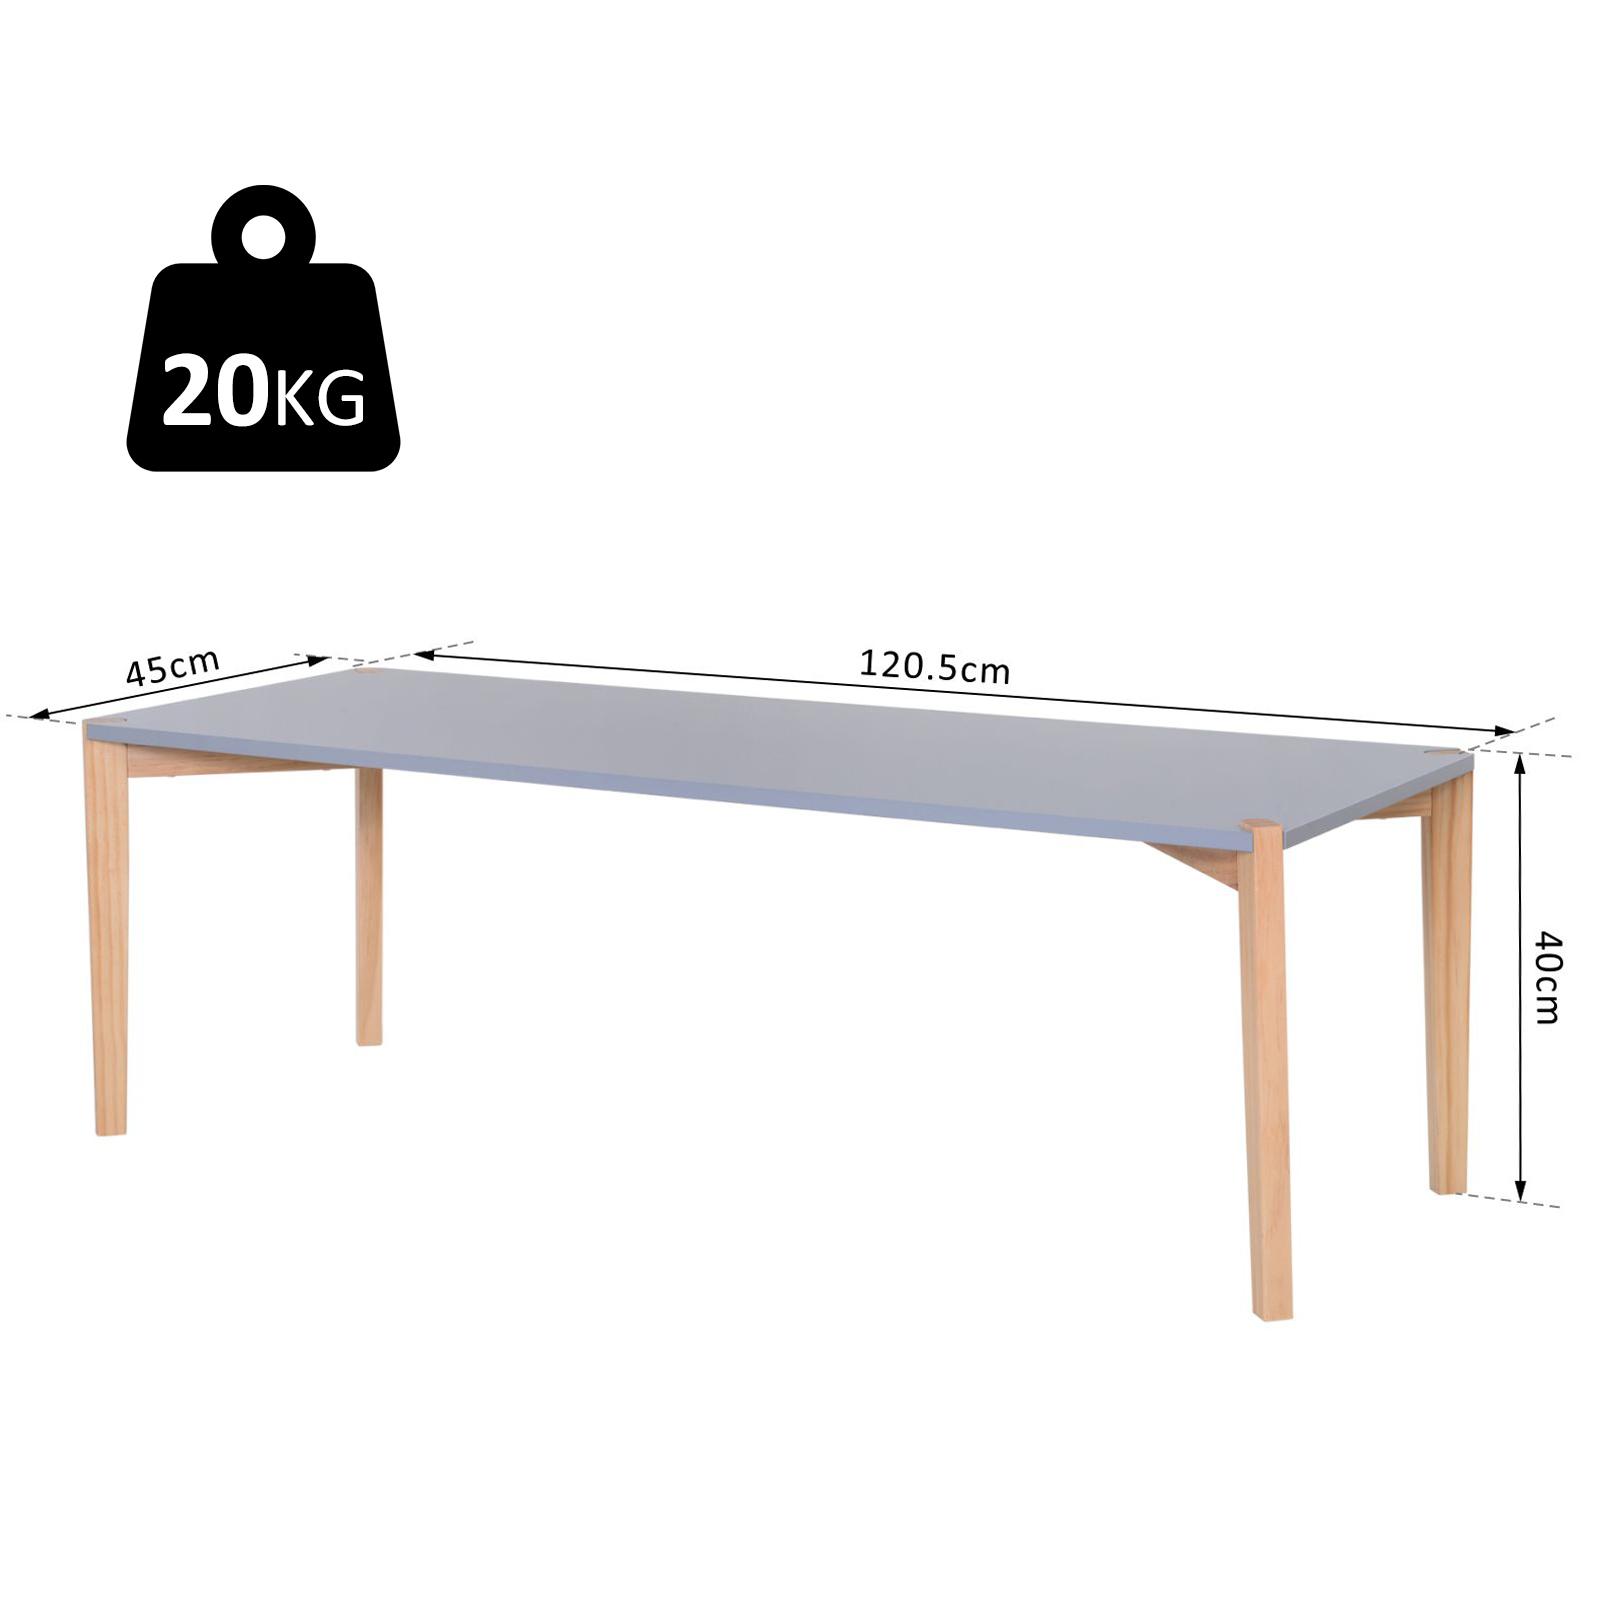 Modern Style Rectangular Living Room Coffee Table Solid Wood Legs – 120cm